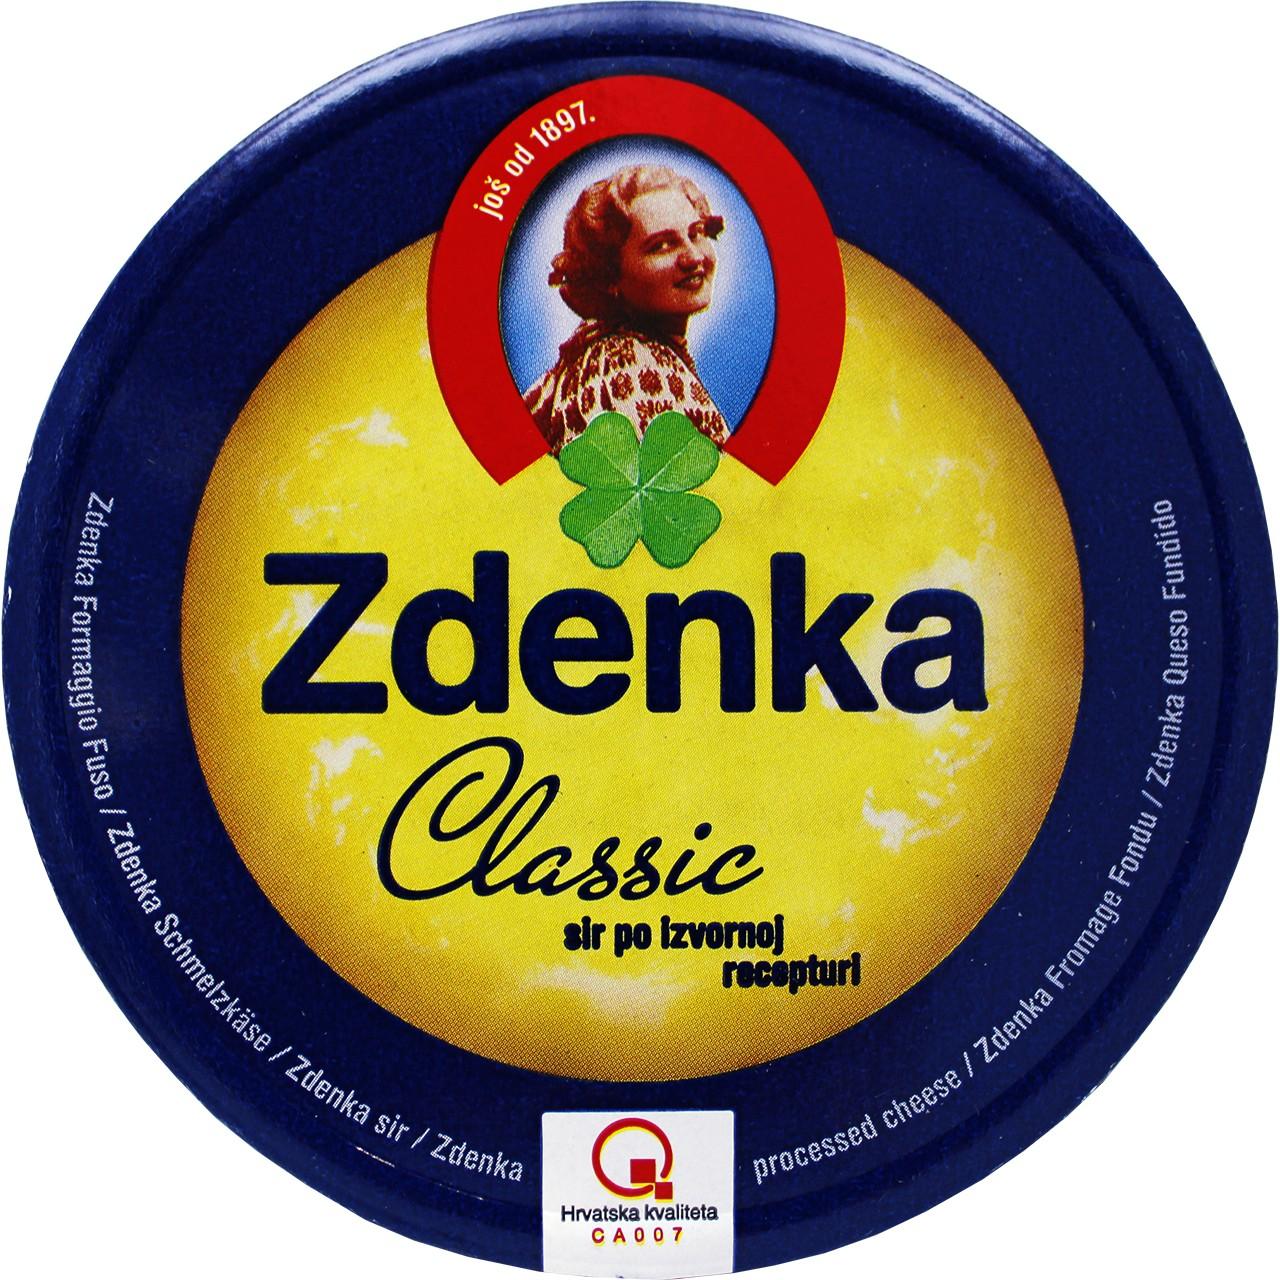 Schmelzkäse - Zdenka Classic Sir 140g